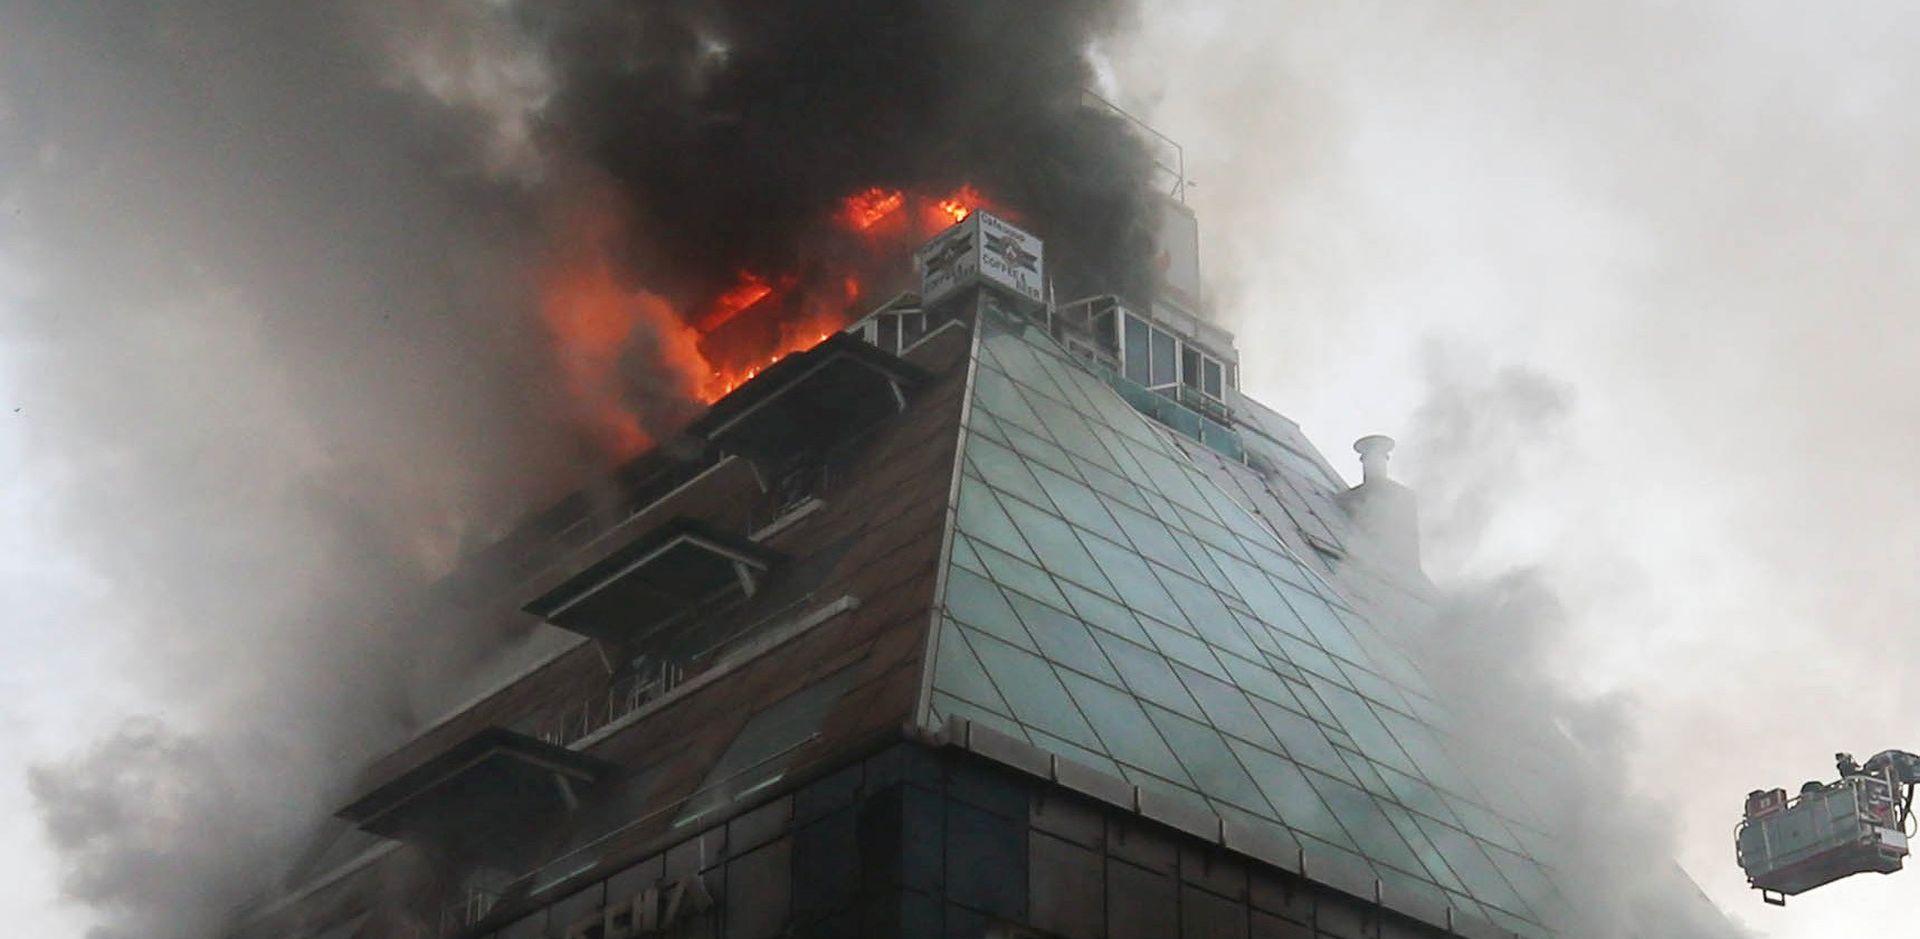 JUŽNA KOREJA Najmanje 29 mrtvih u požaru sportskog centra